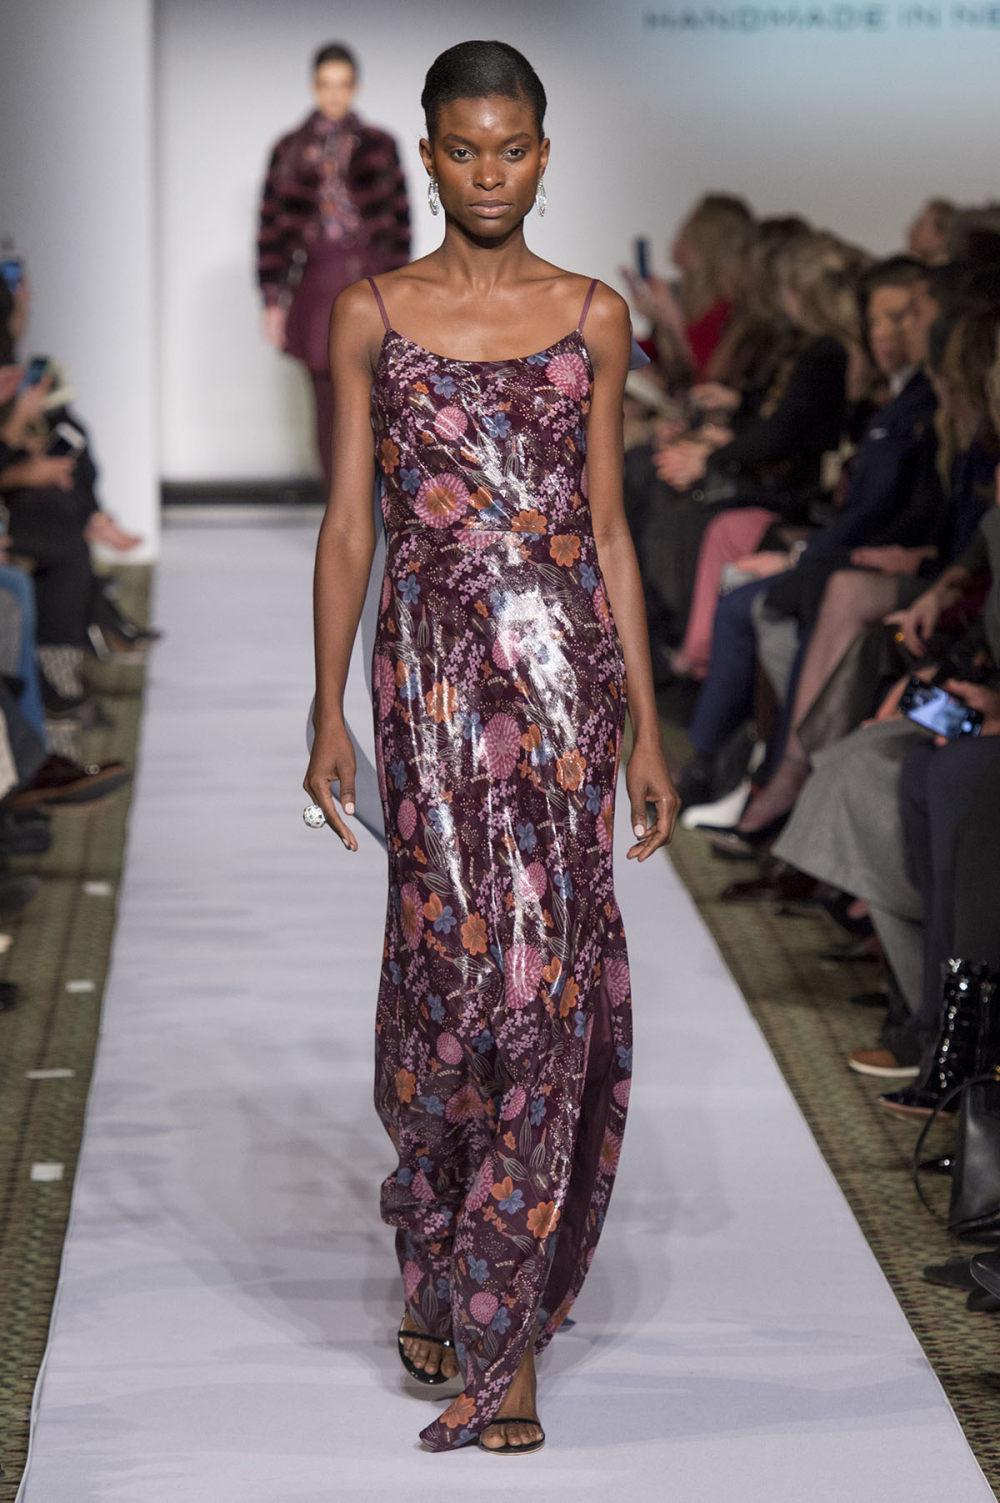 Carolina Herrera时装系列用鲜艳的颜色充满智能的黑白色调-24.jpg